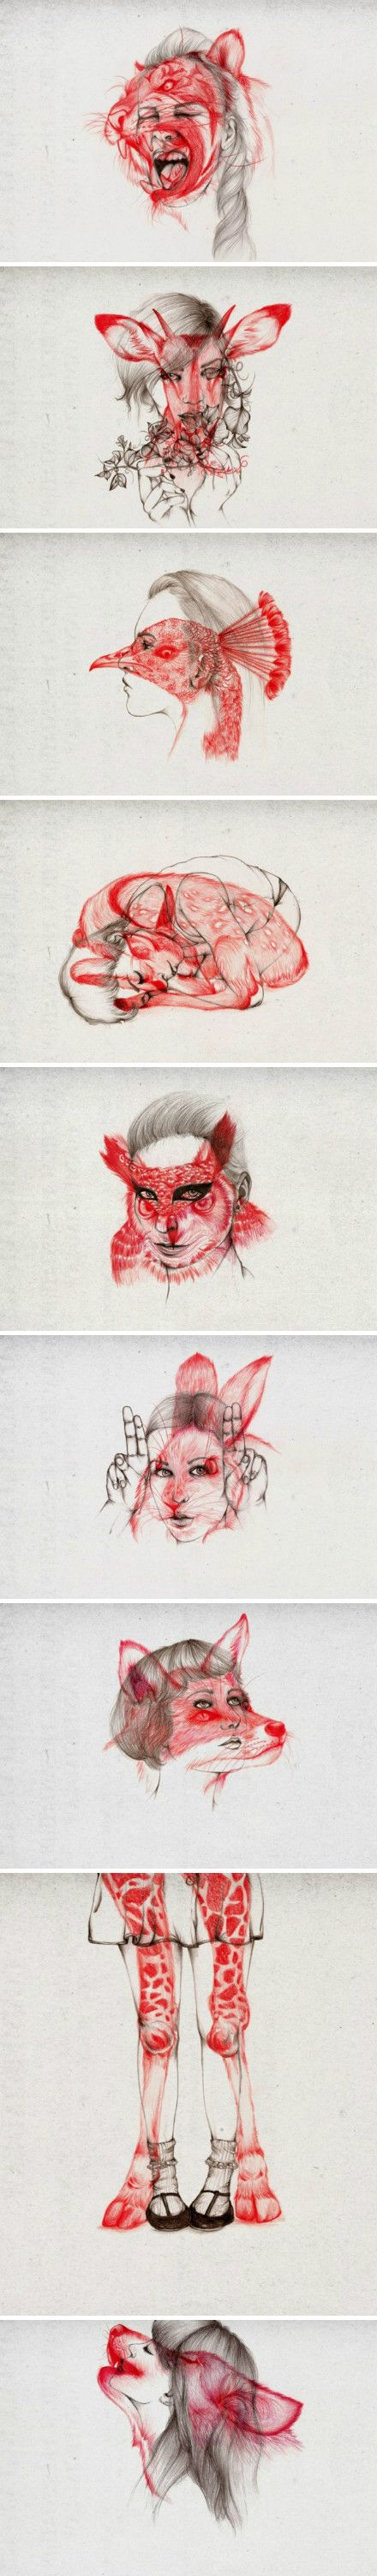 Peony Yip Animal Morphing Illustrations